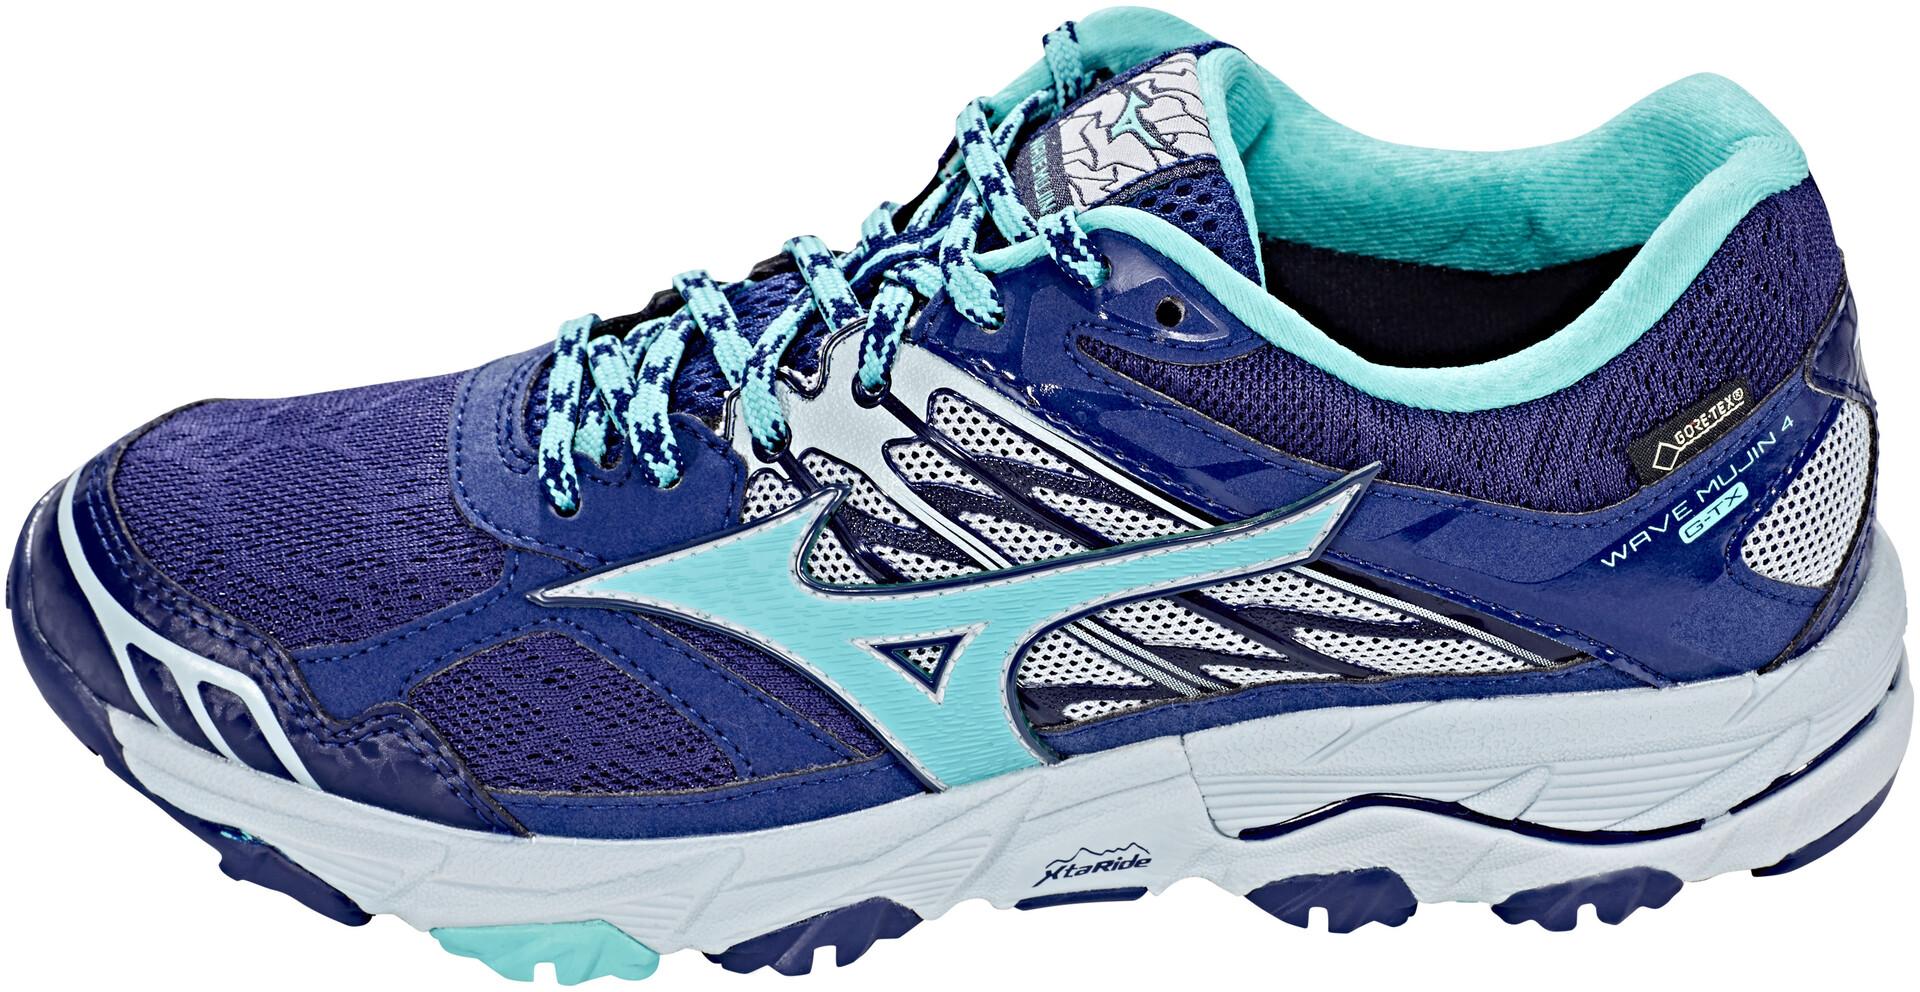 Tx 4 Zapatillas Mizuno Blueturquoisepearl G MujerPatriot Blue Wave Mujin VpGqSzMU